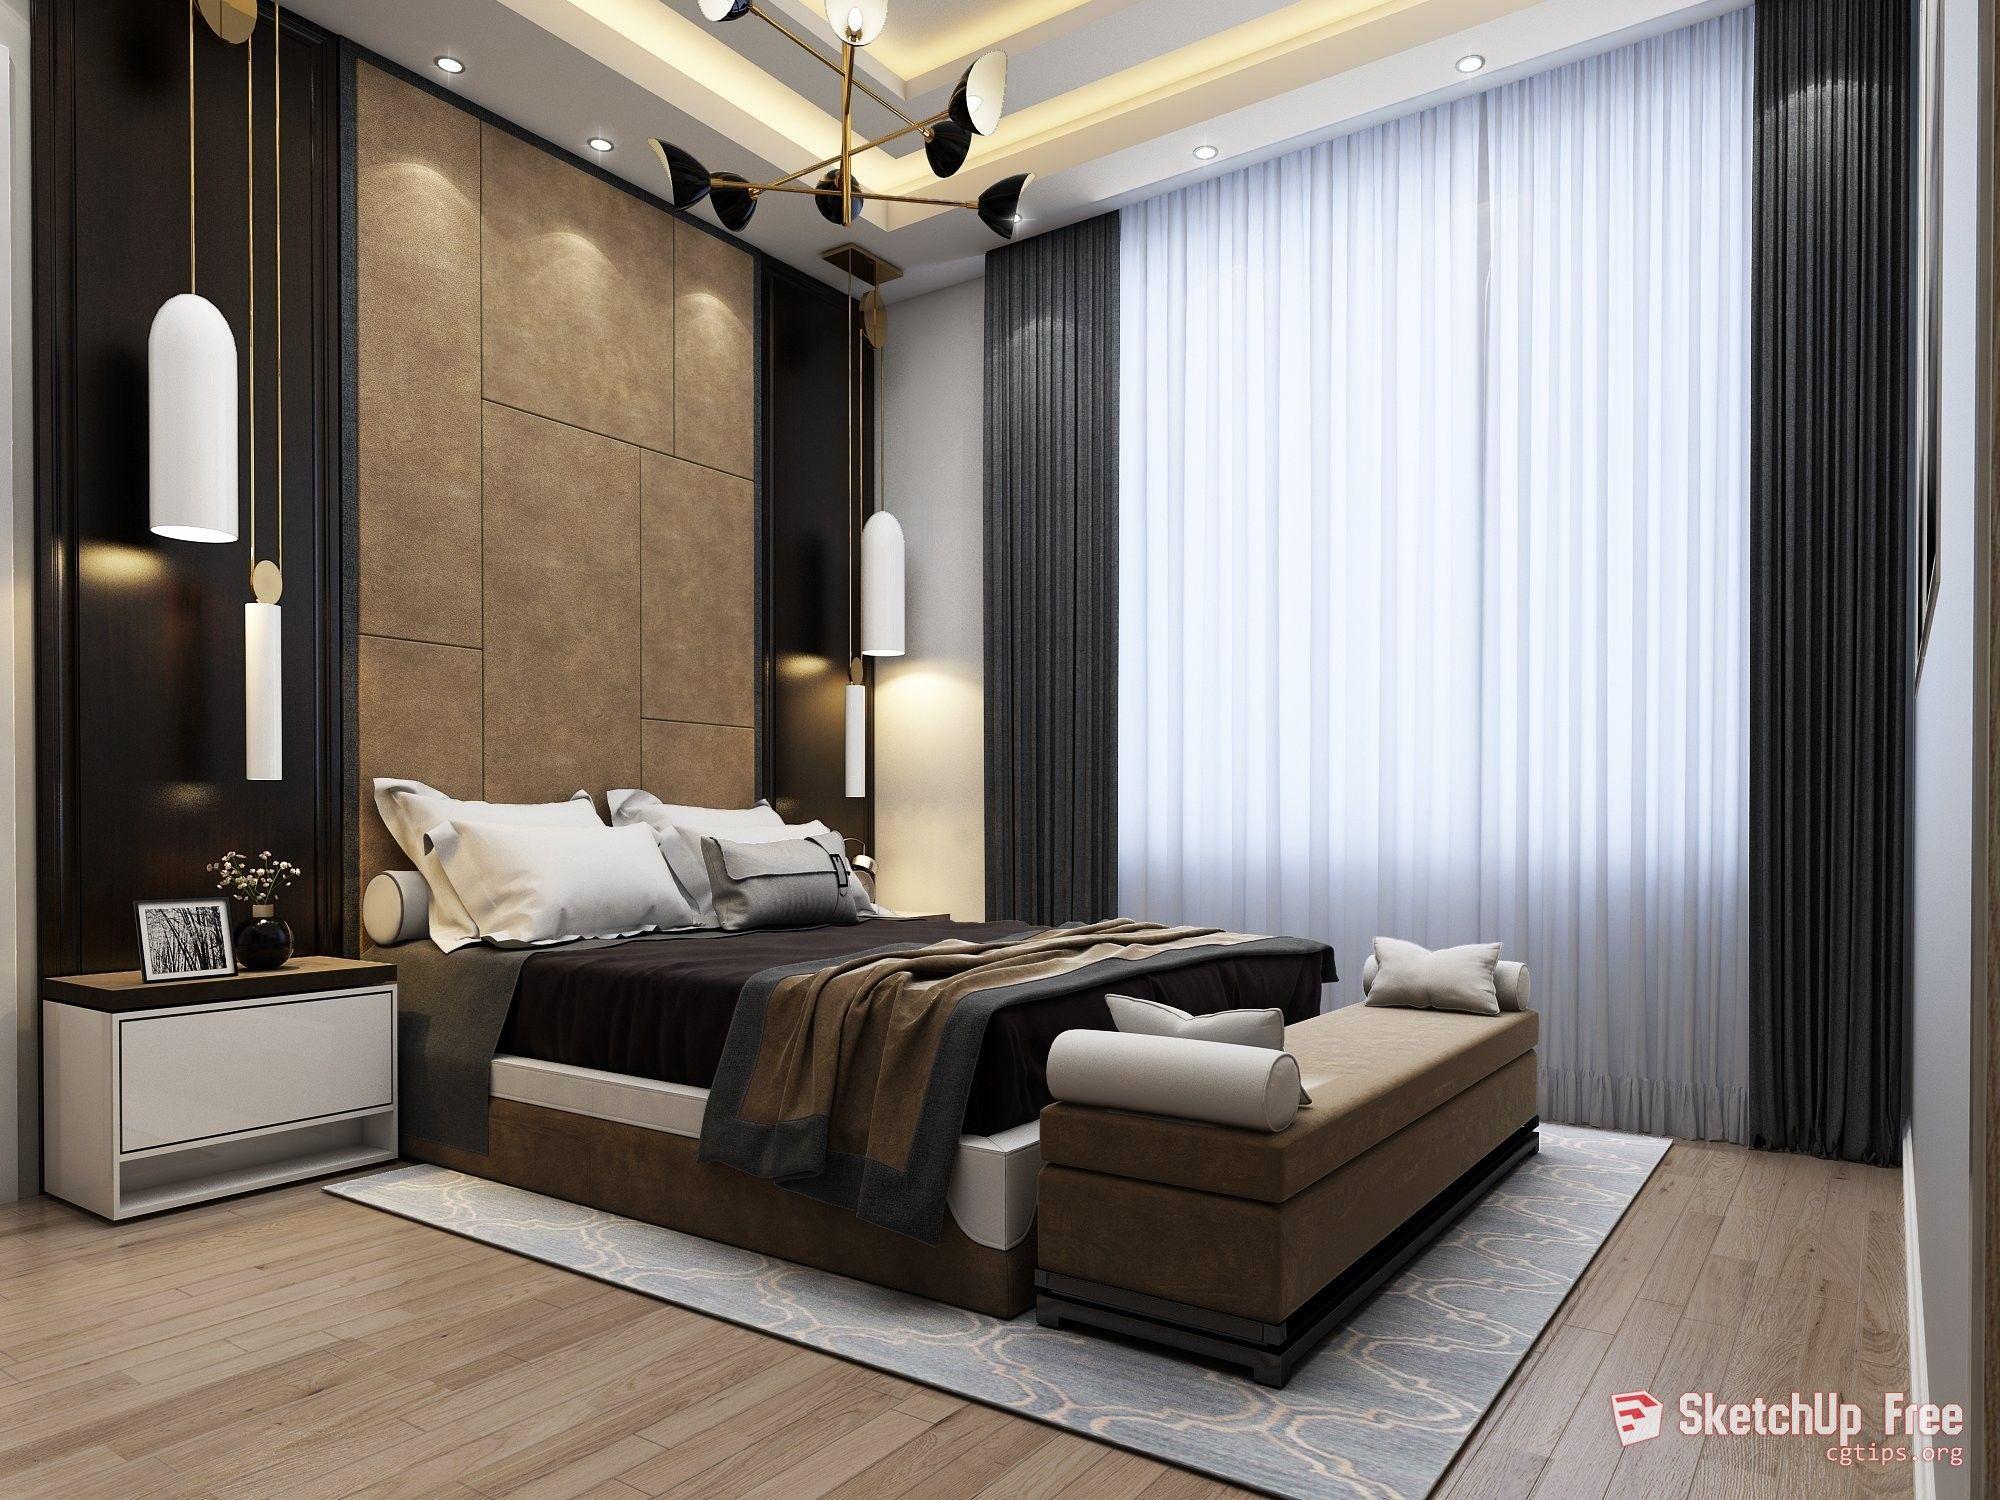 1942 Interior Bedroom Scene Sketchup Model Free Download ... on Model Bedroom Design  id=27806